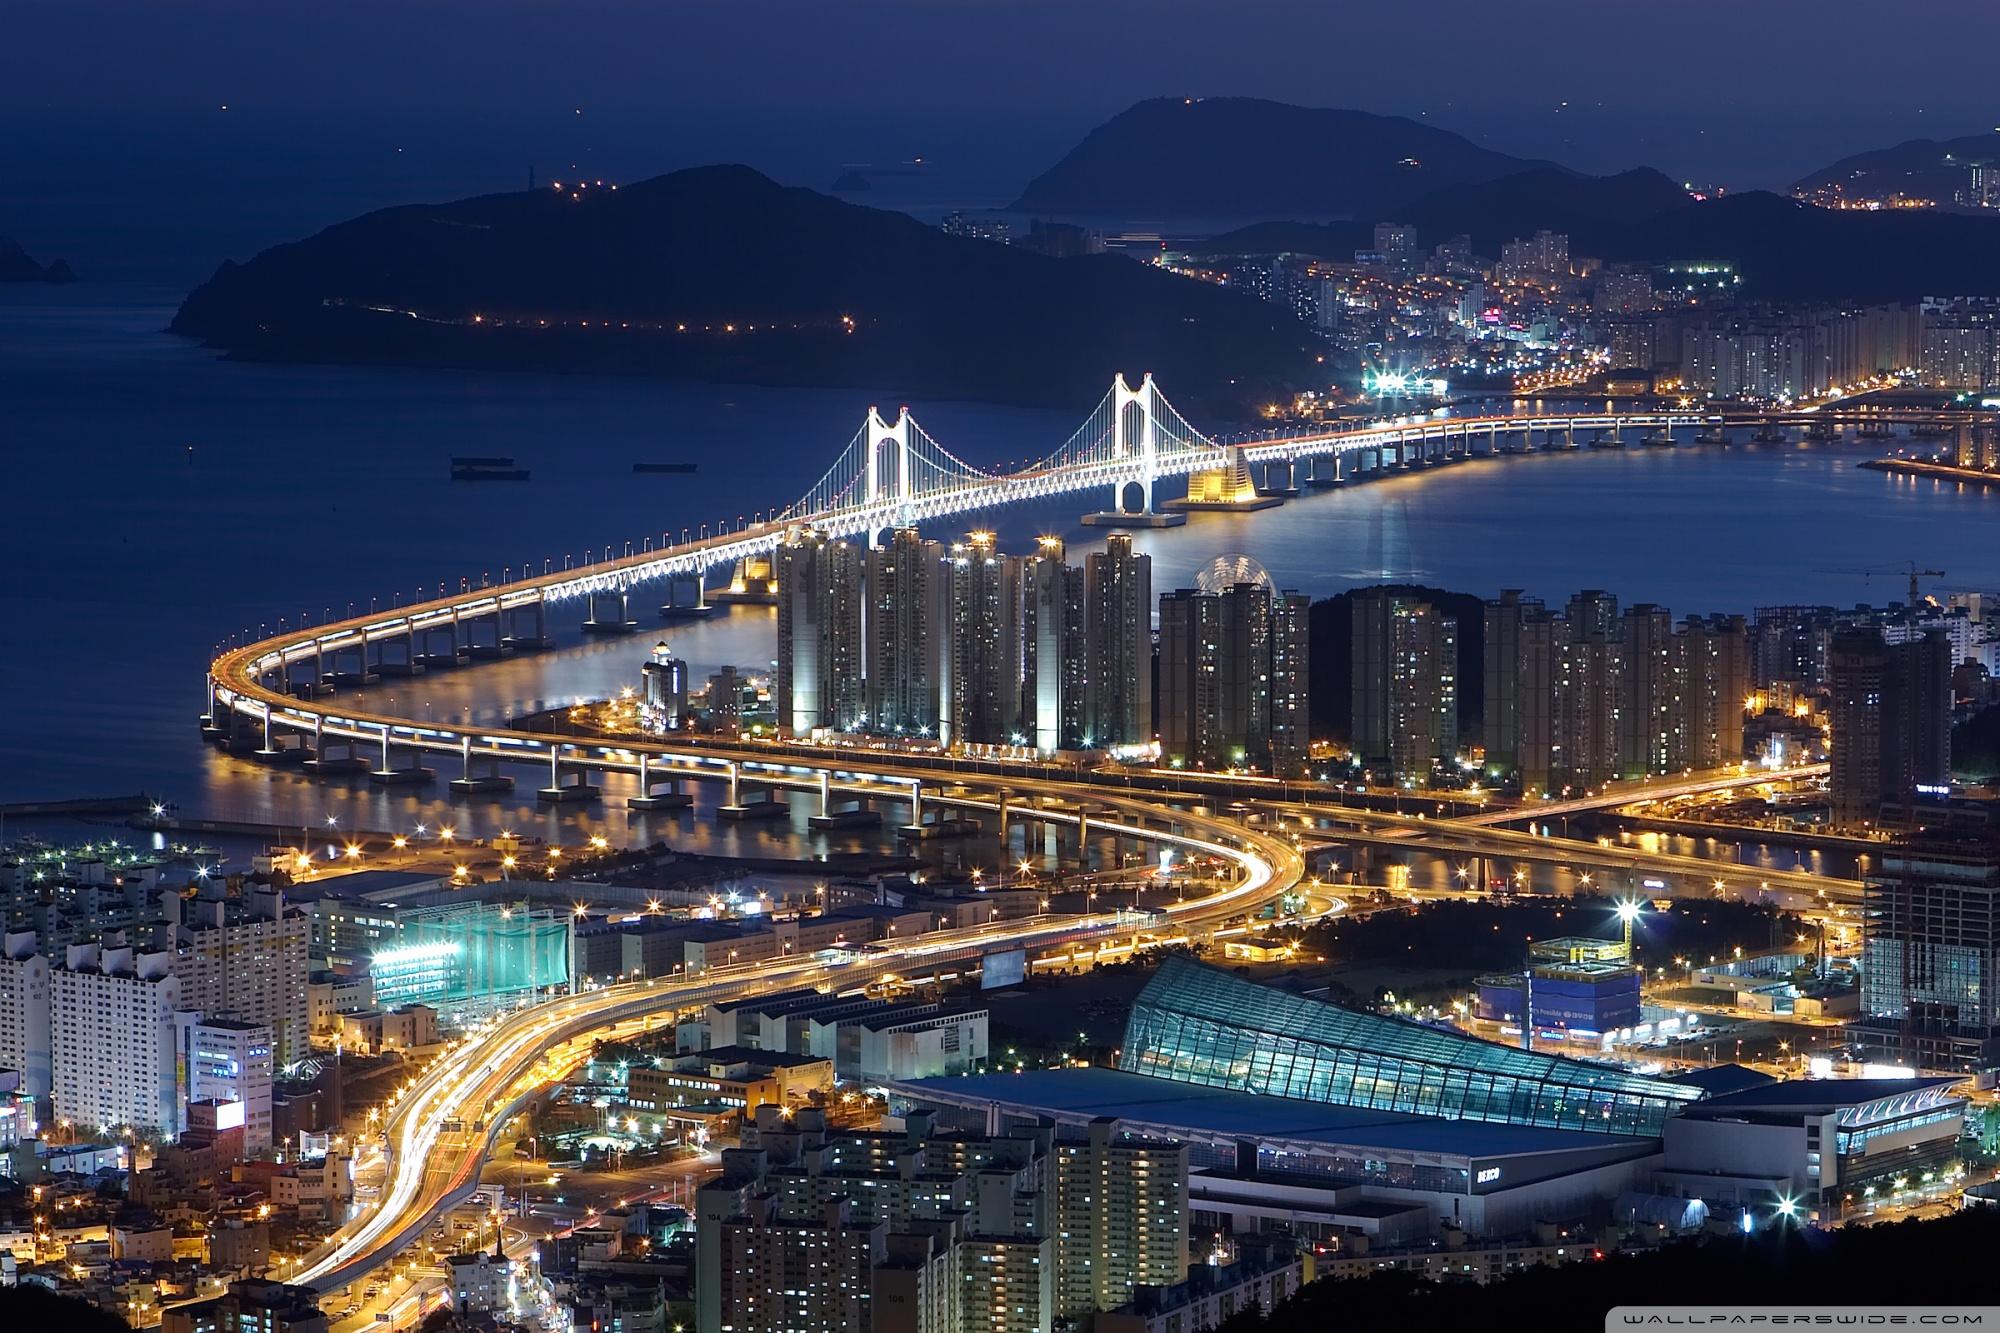 Gwangan Bridge Busan South Korea 4K HD Desktop Wallpaper for 2000x1333